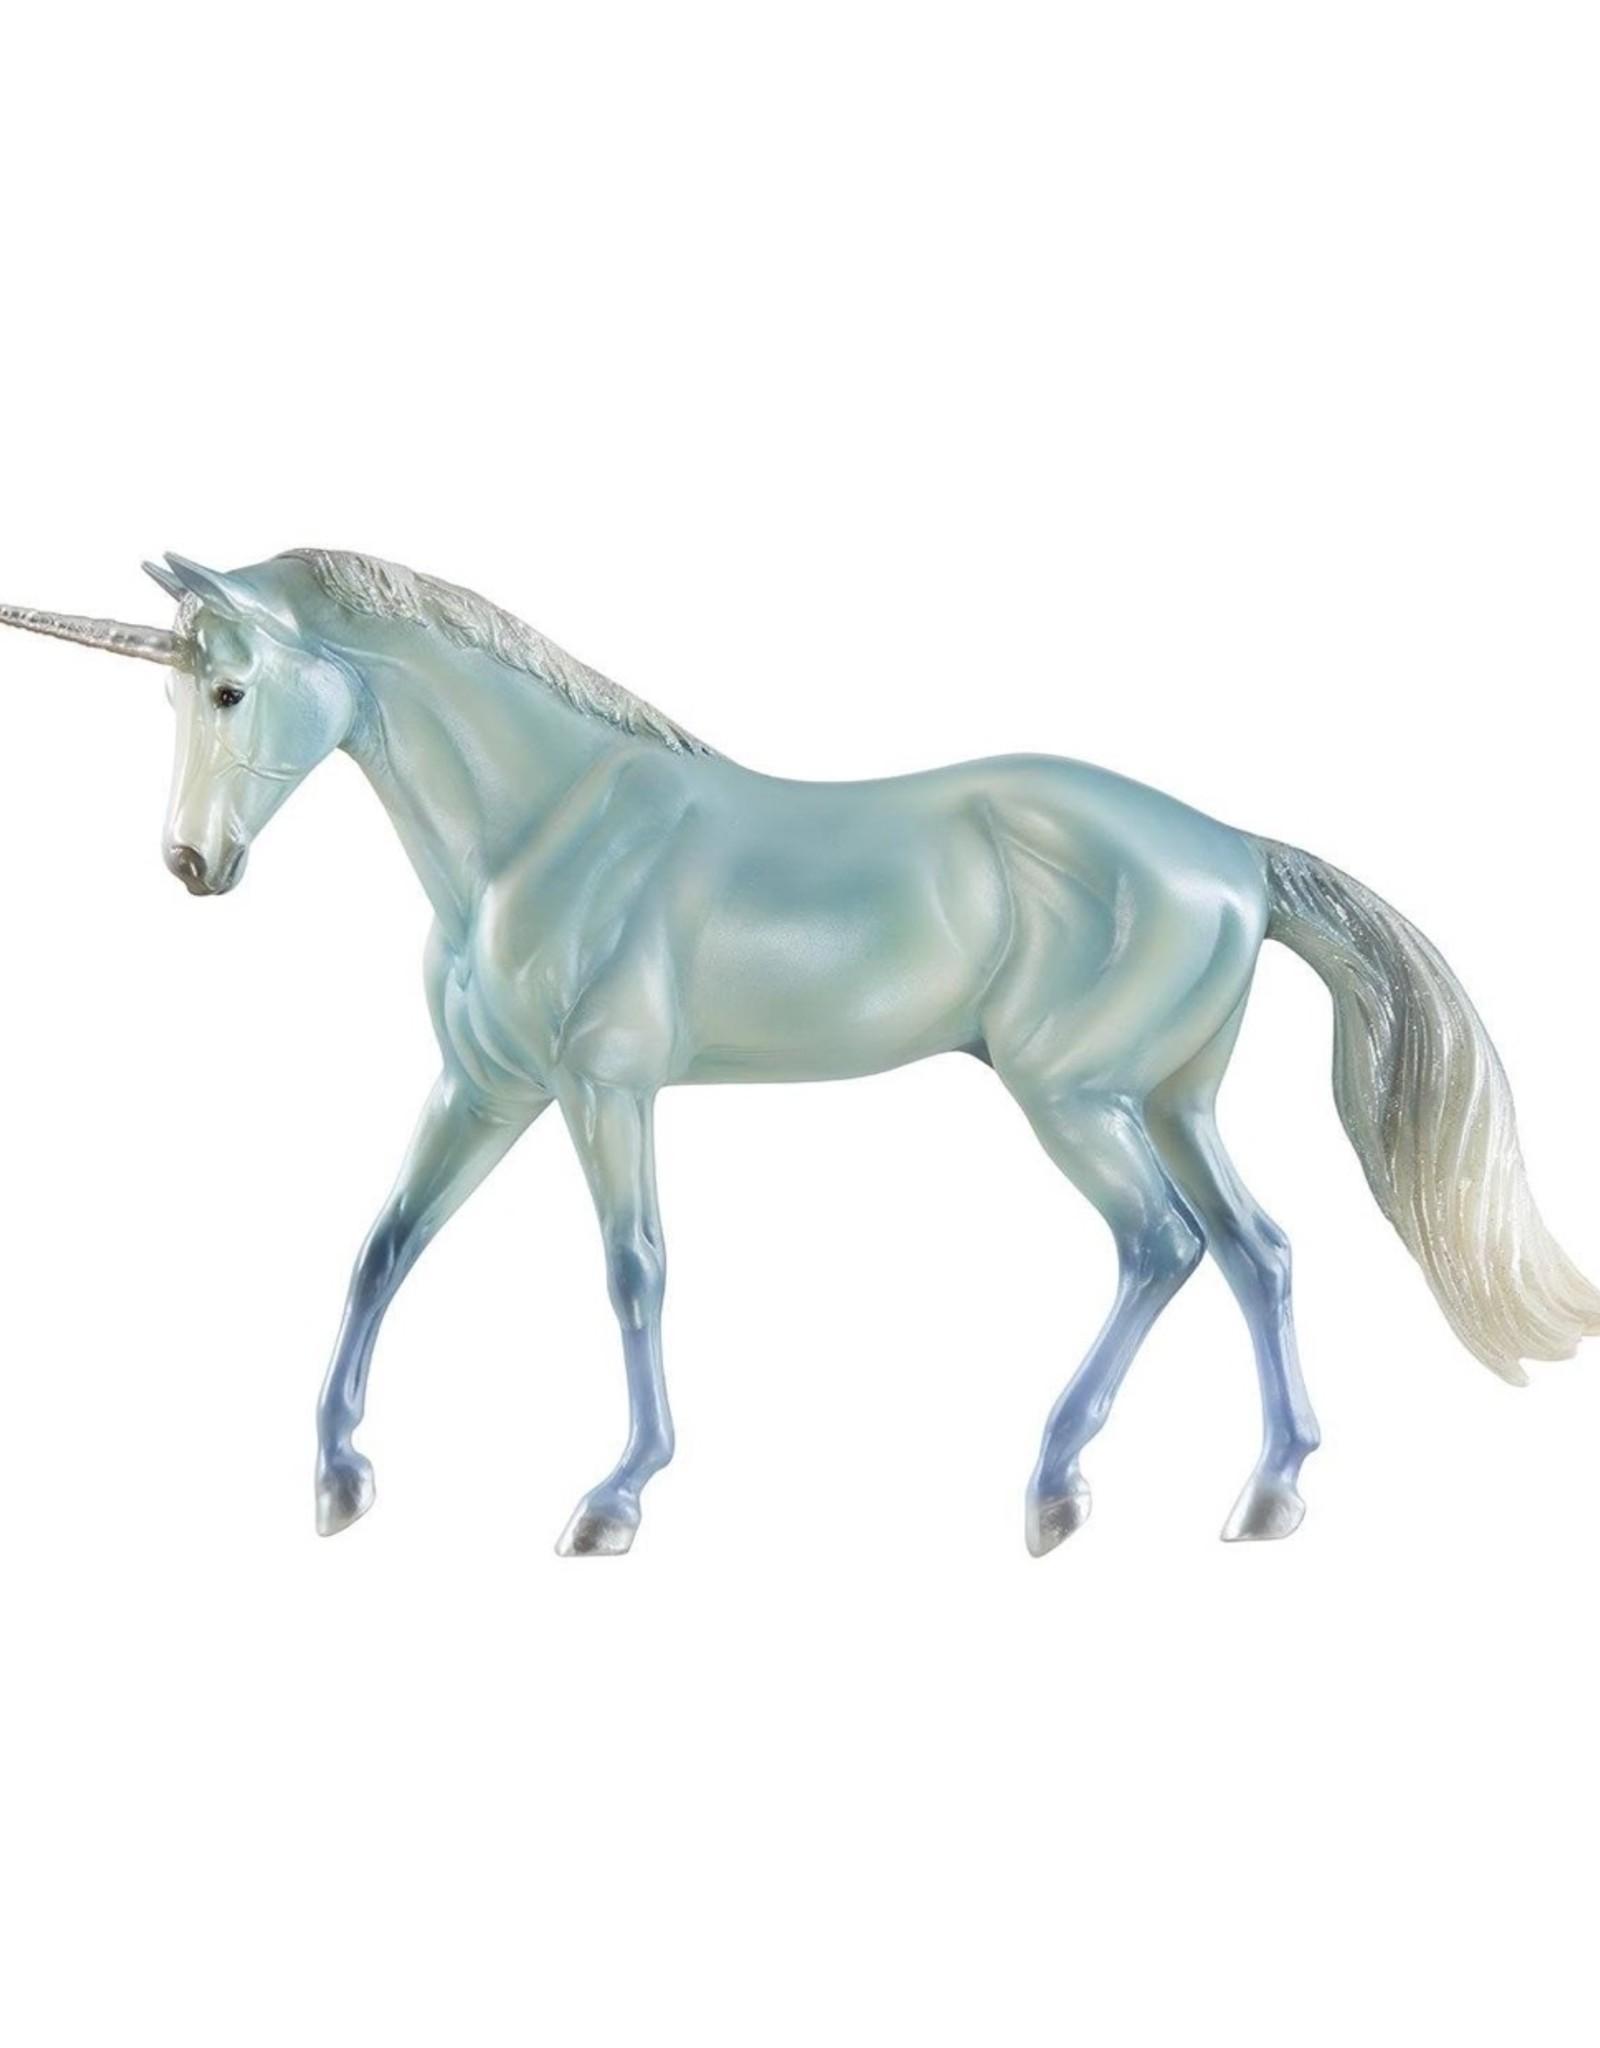 Breyer Le Mer Unicorn of the Sea